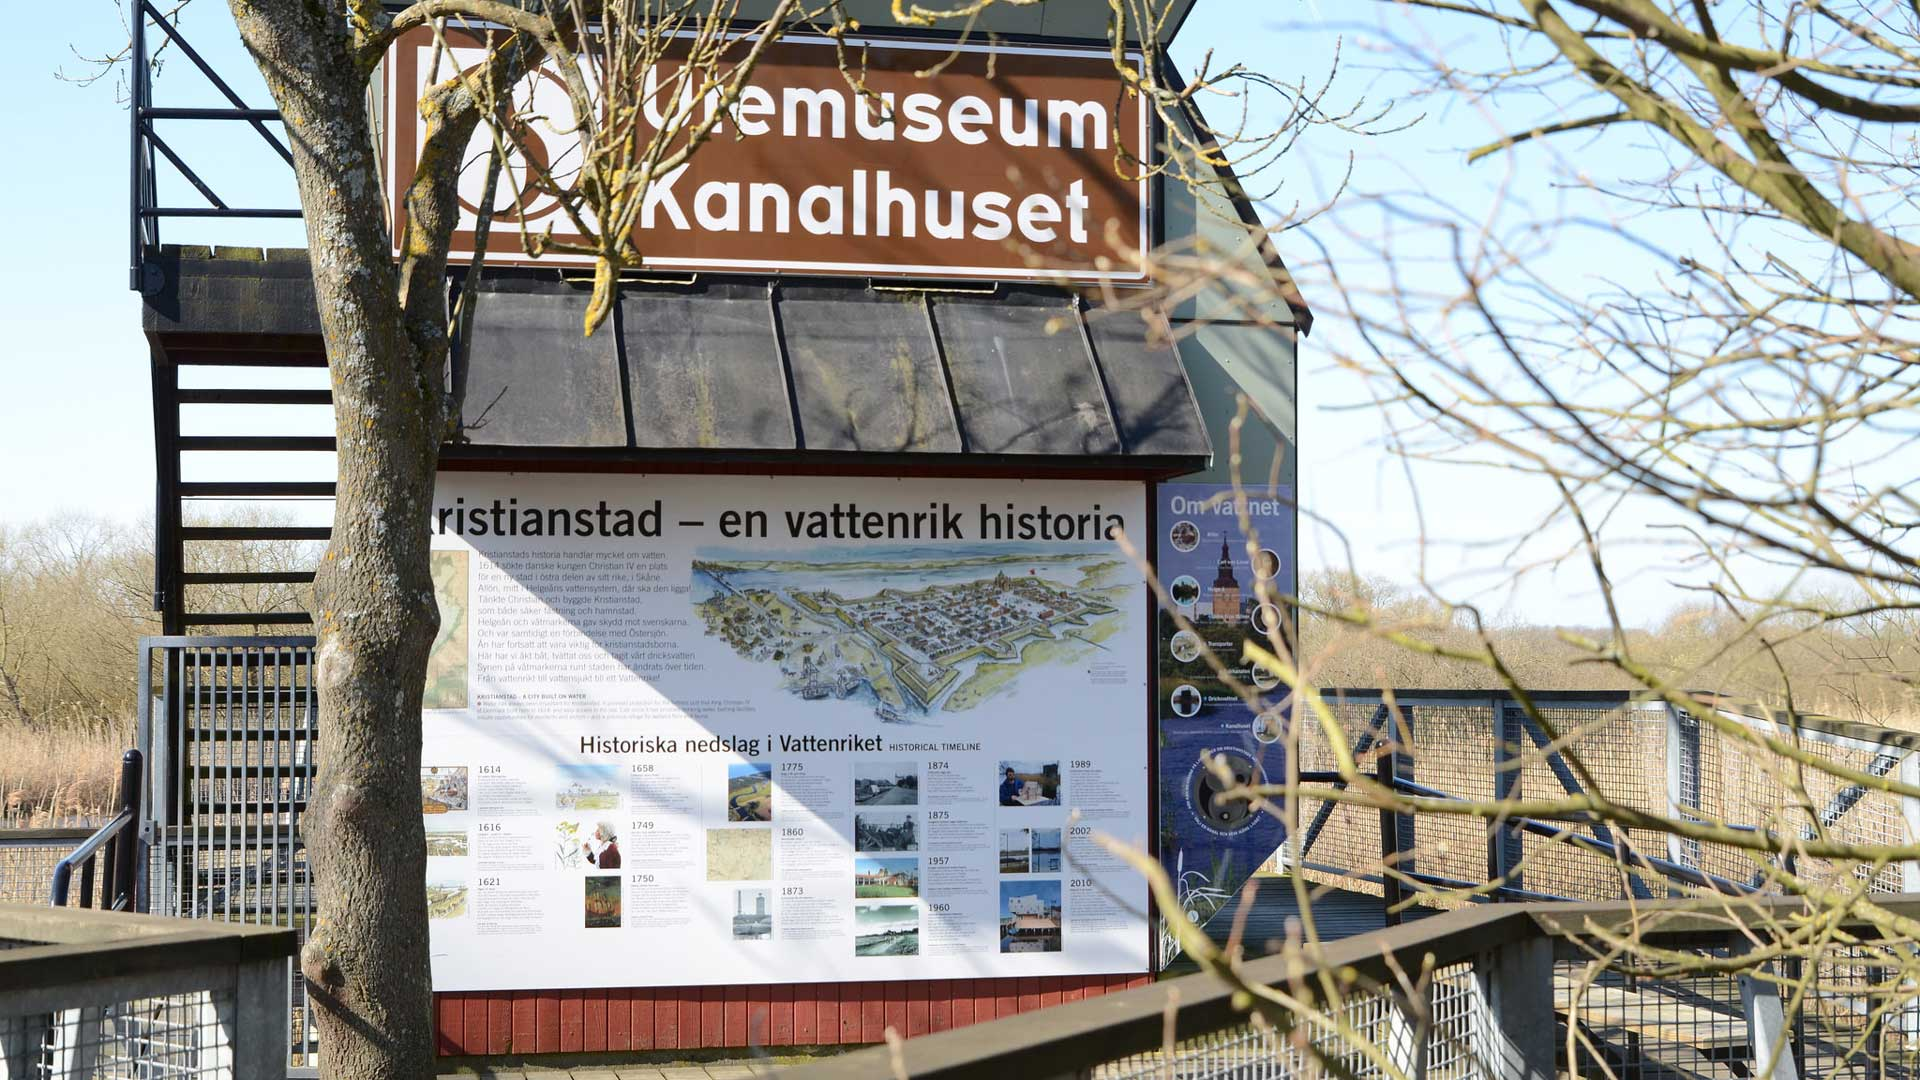 Utemuseum Kanalhuset. Foto: Mattias Roos, Kristianstads kommun